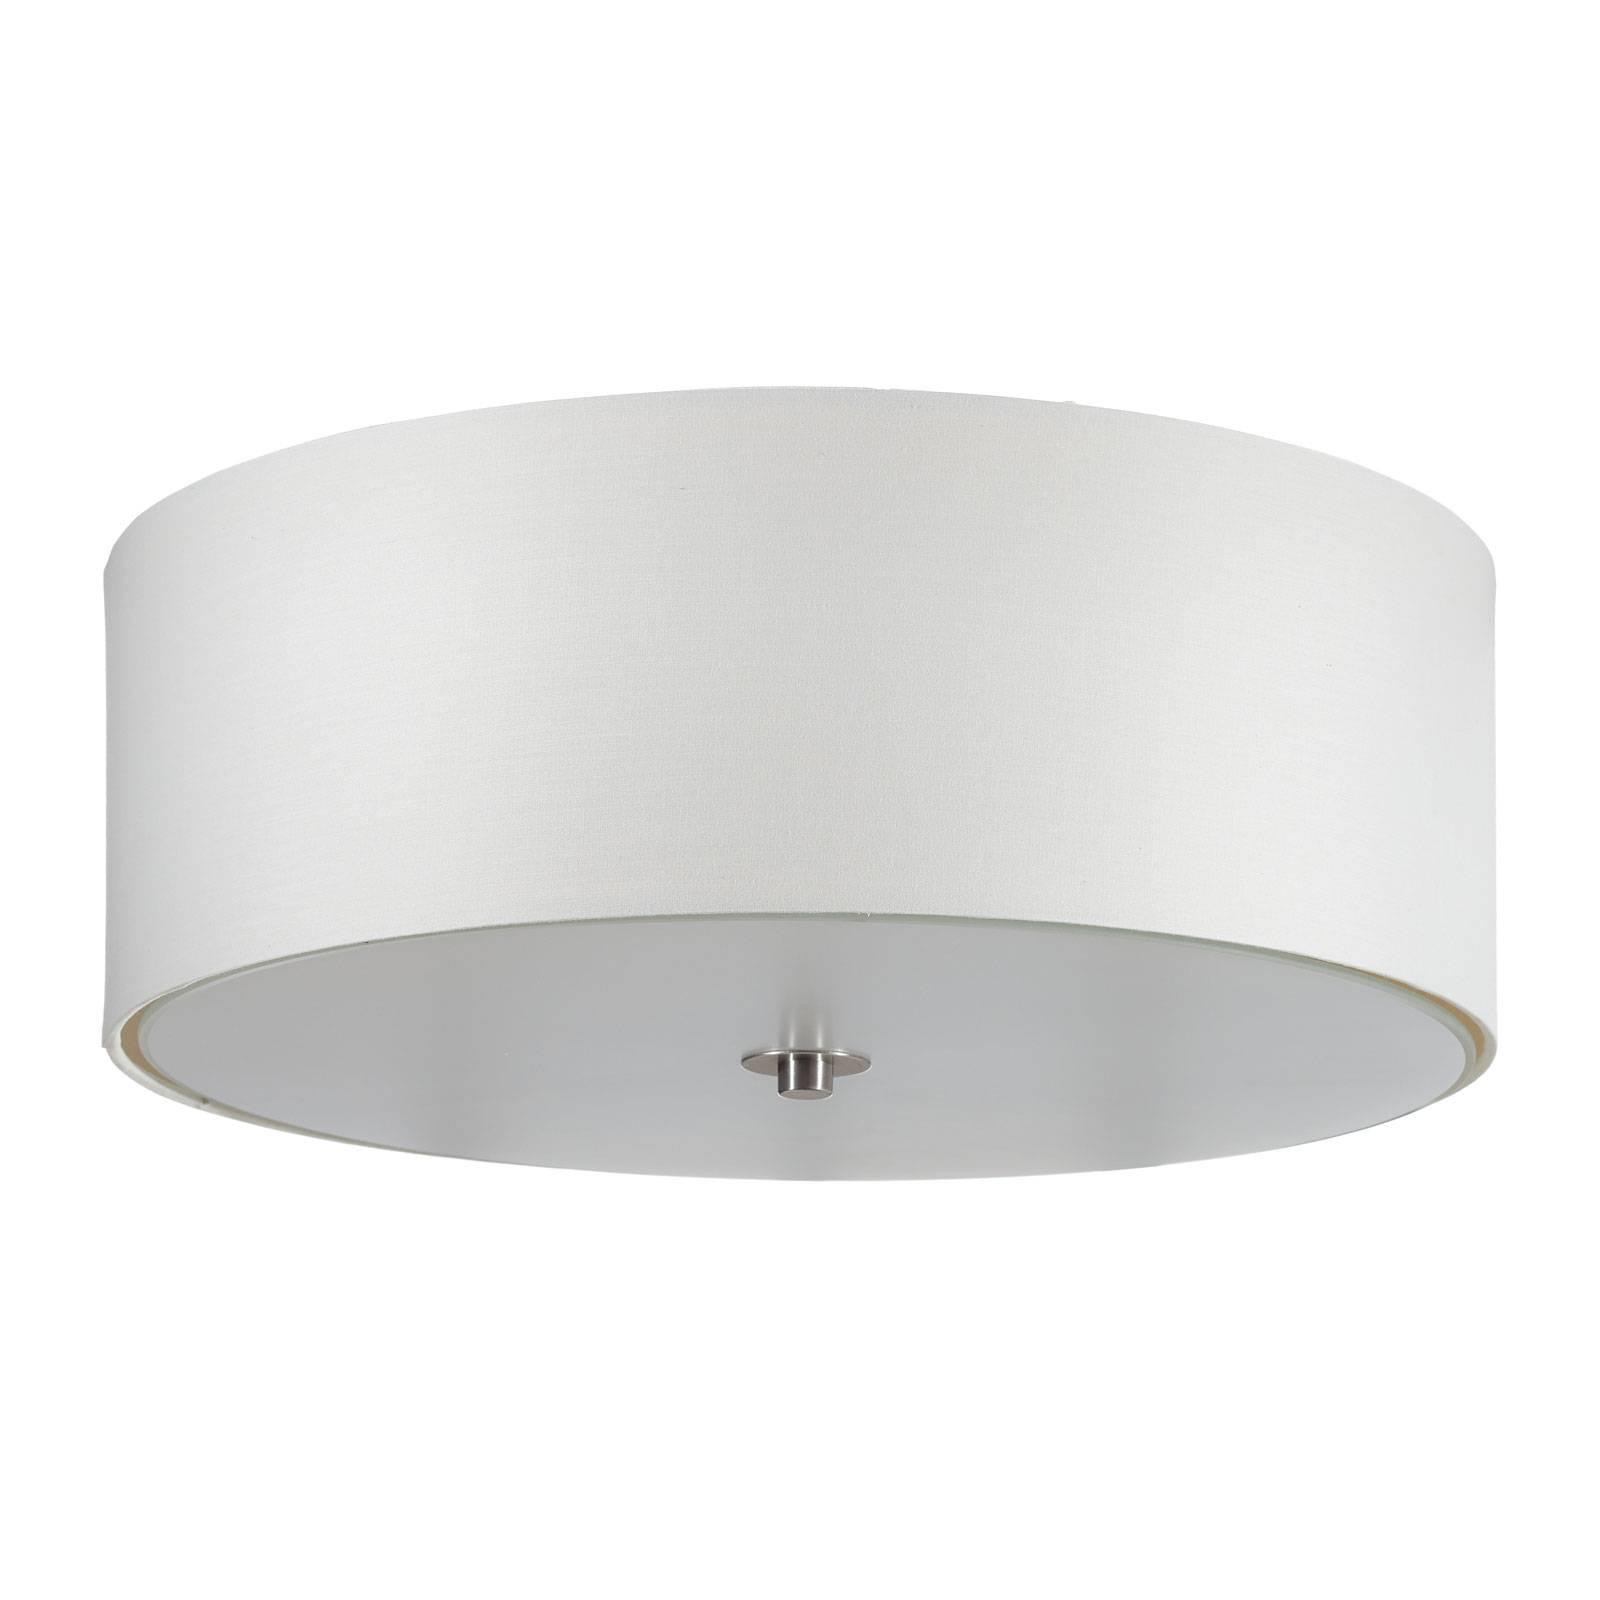 Lucande Patrik lampa sufitowa Ø48cm kremowa